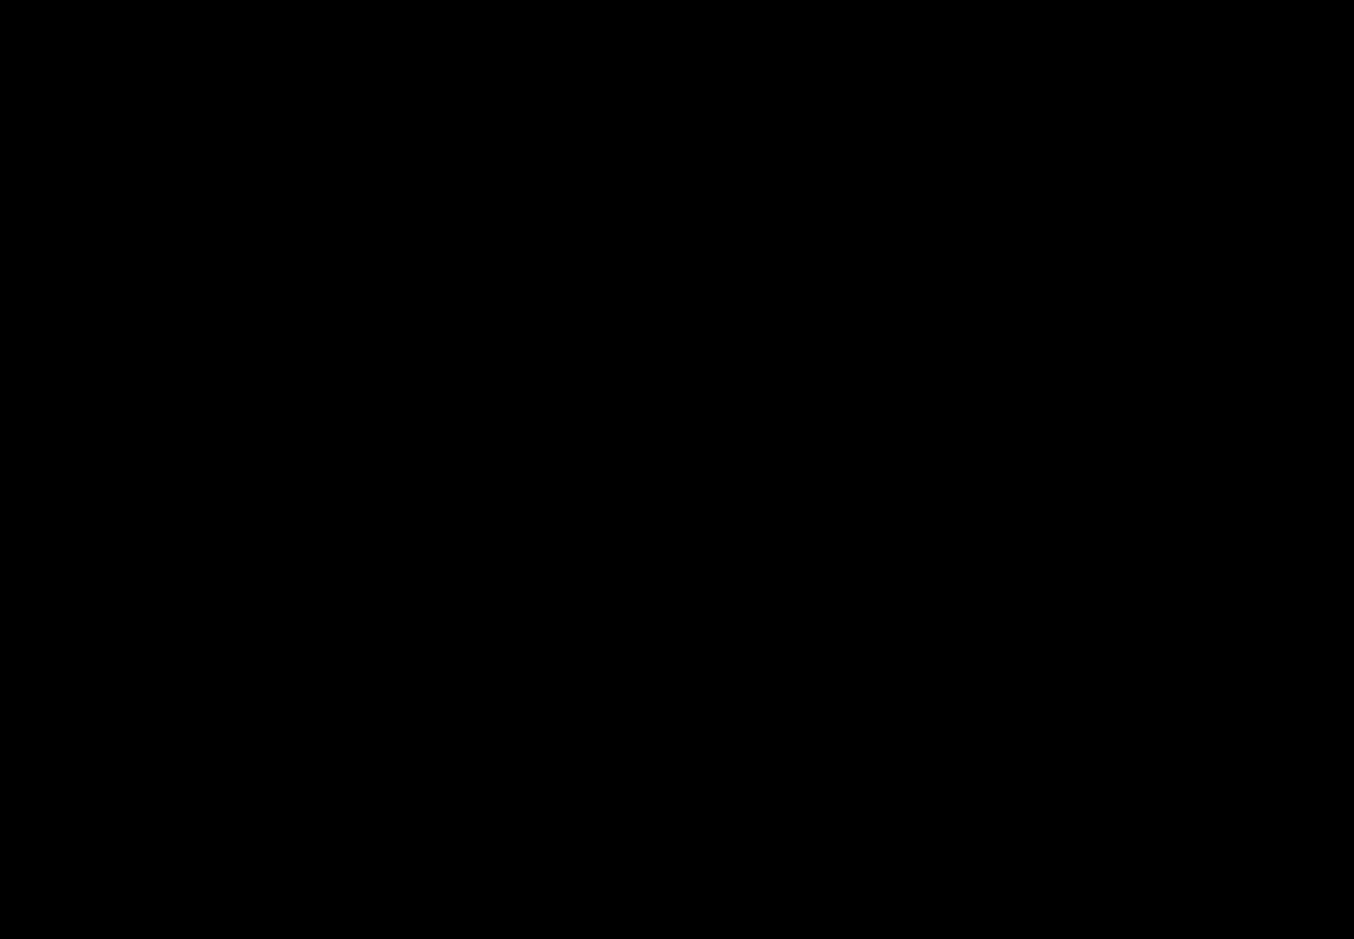 Amino-dPEG®₄-(m-dPEG®₈)₃